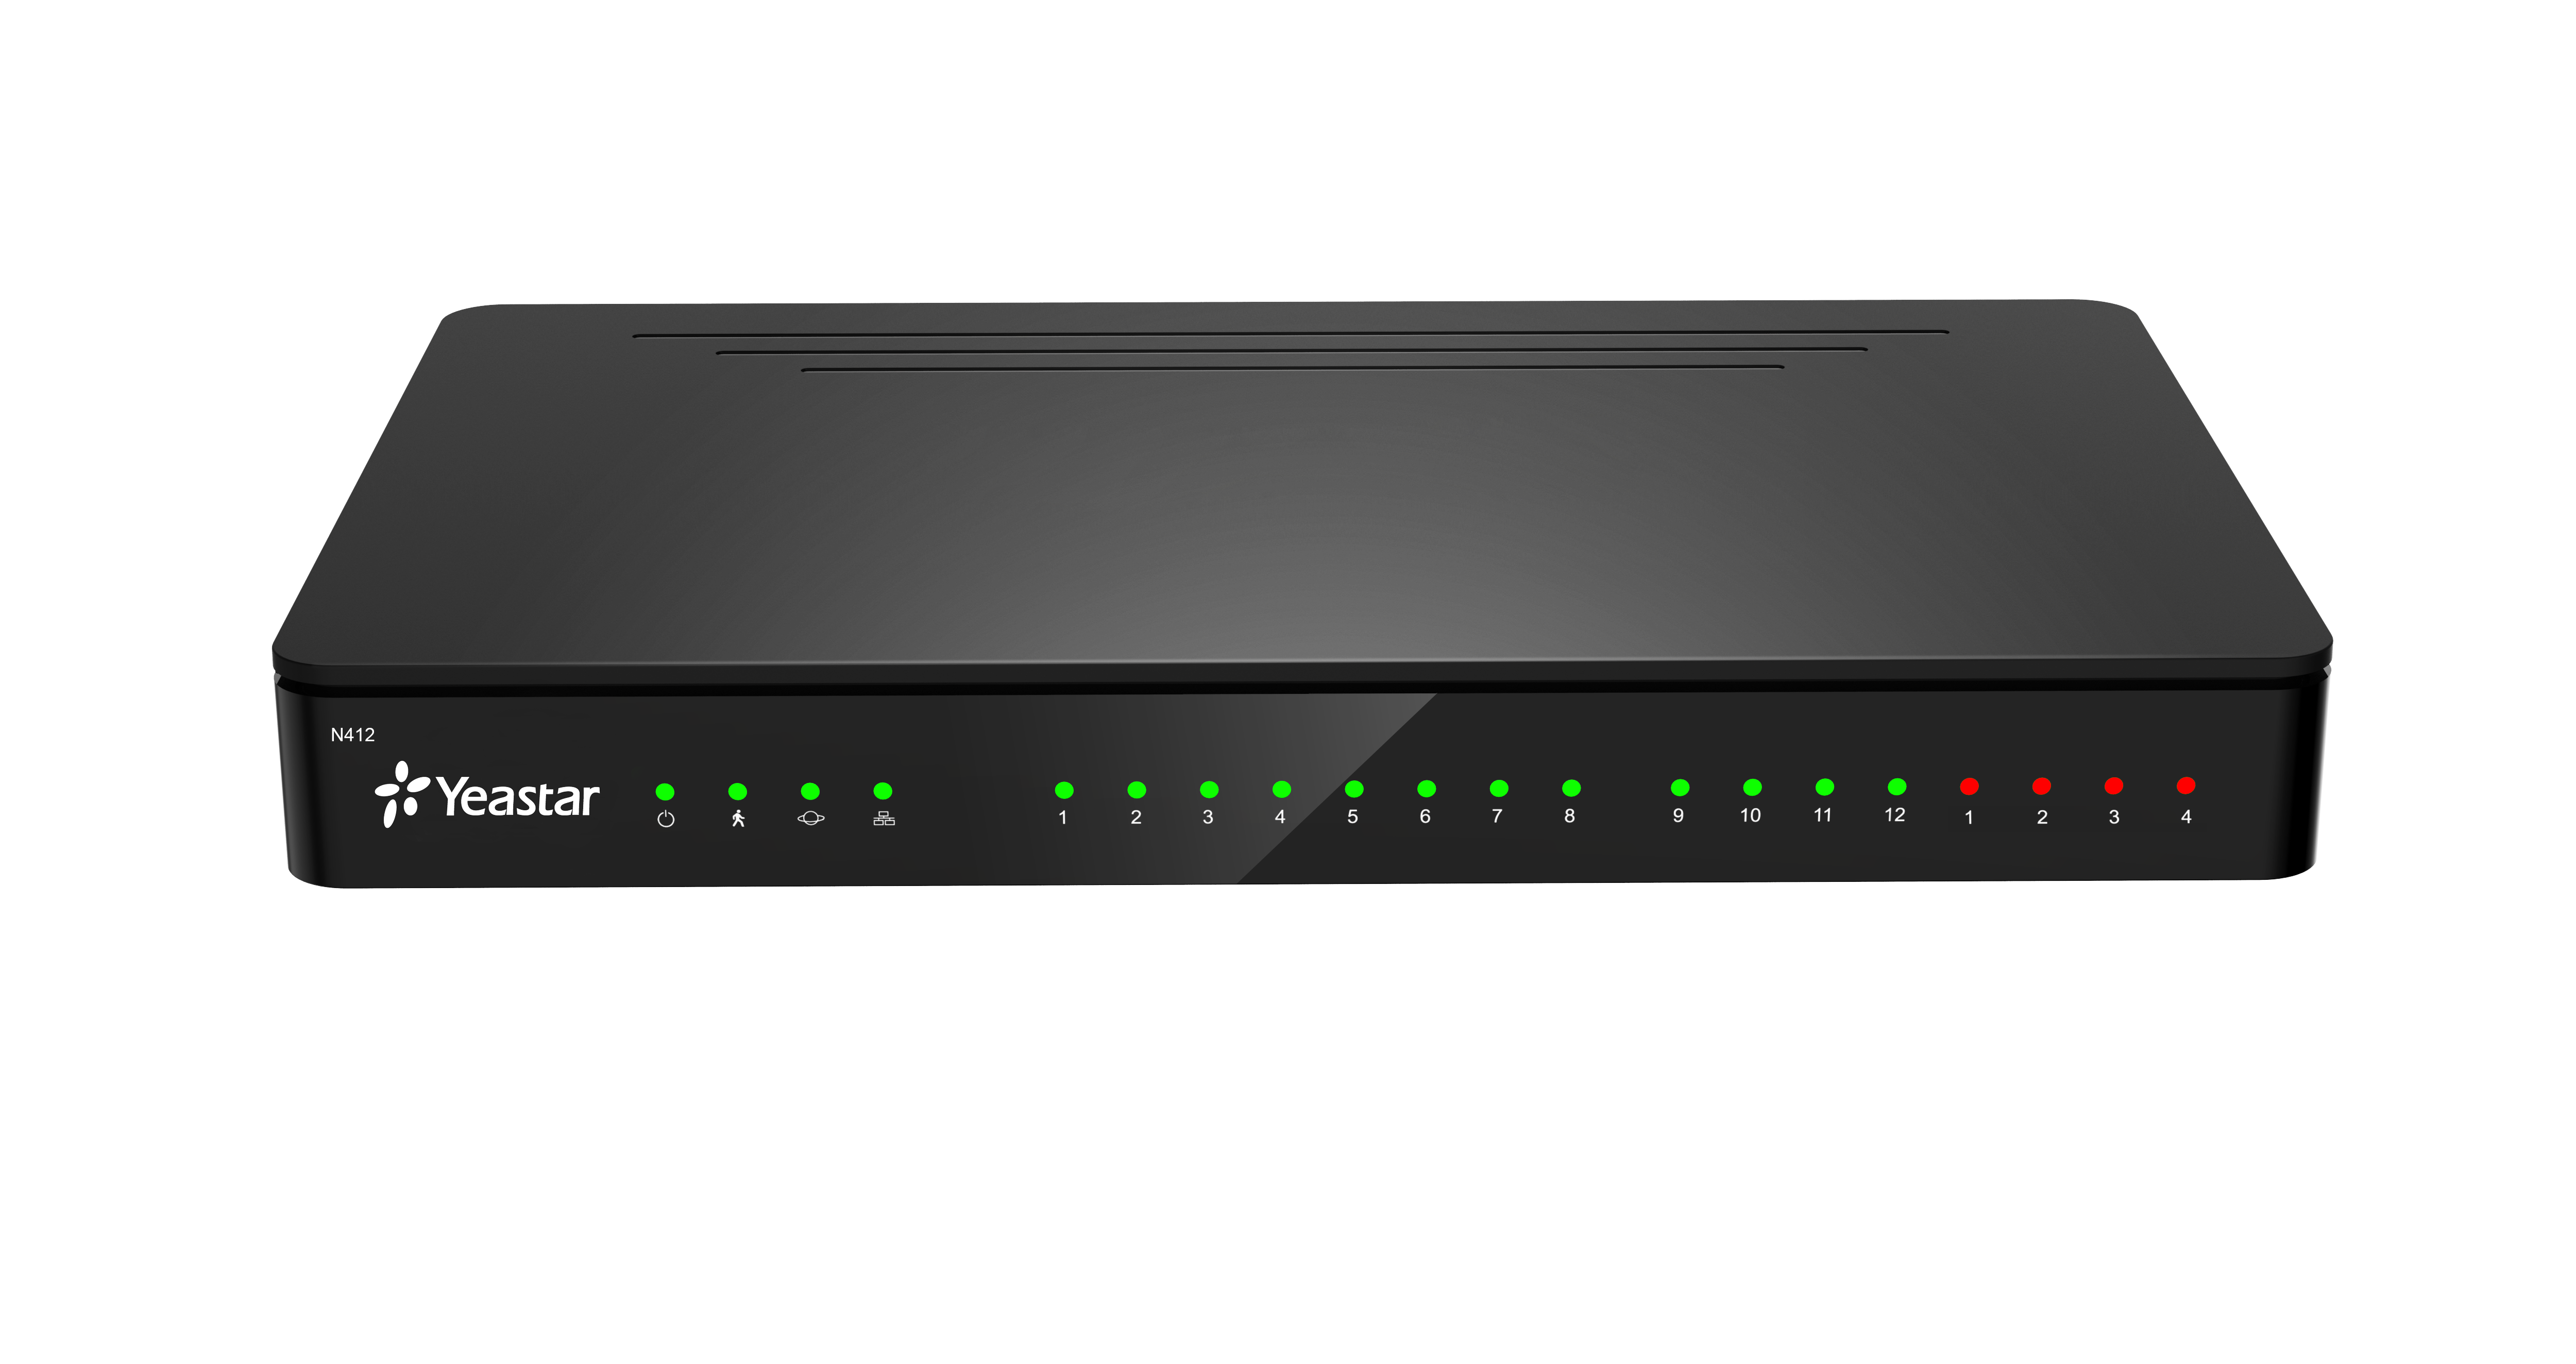 Yeastar Smart PBX N412 základní konfigurace